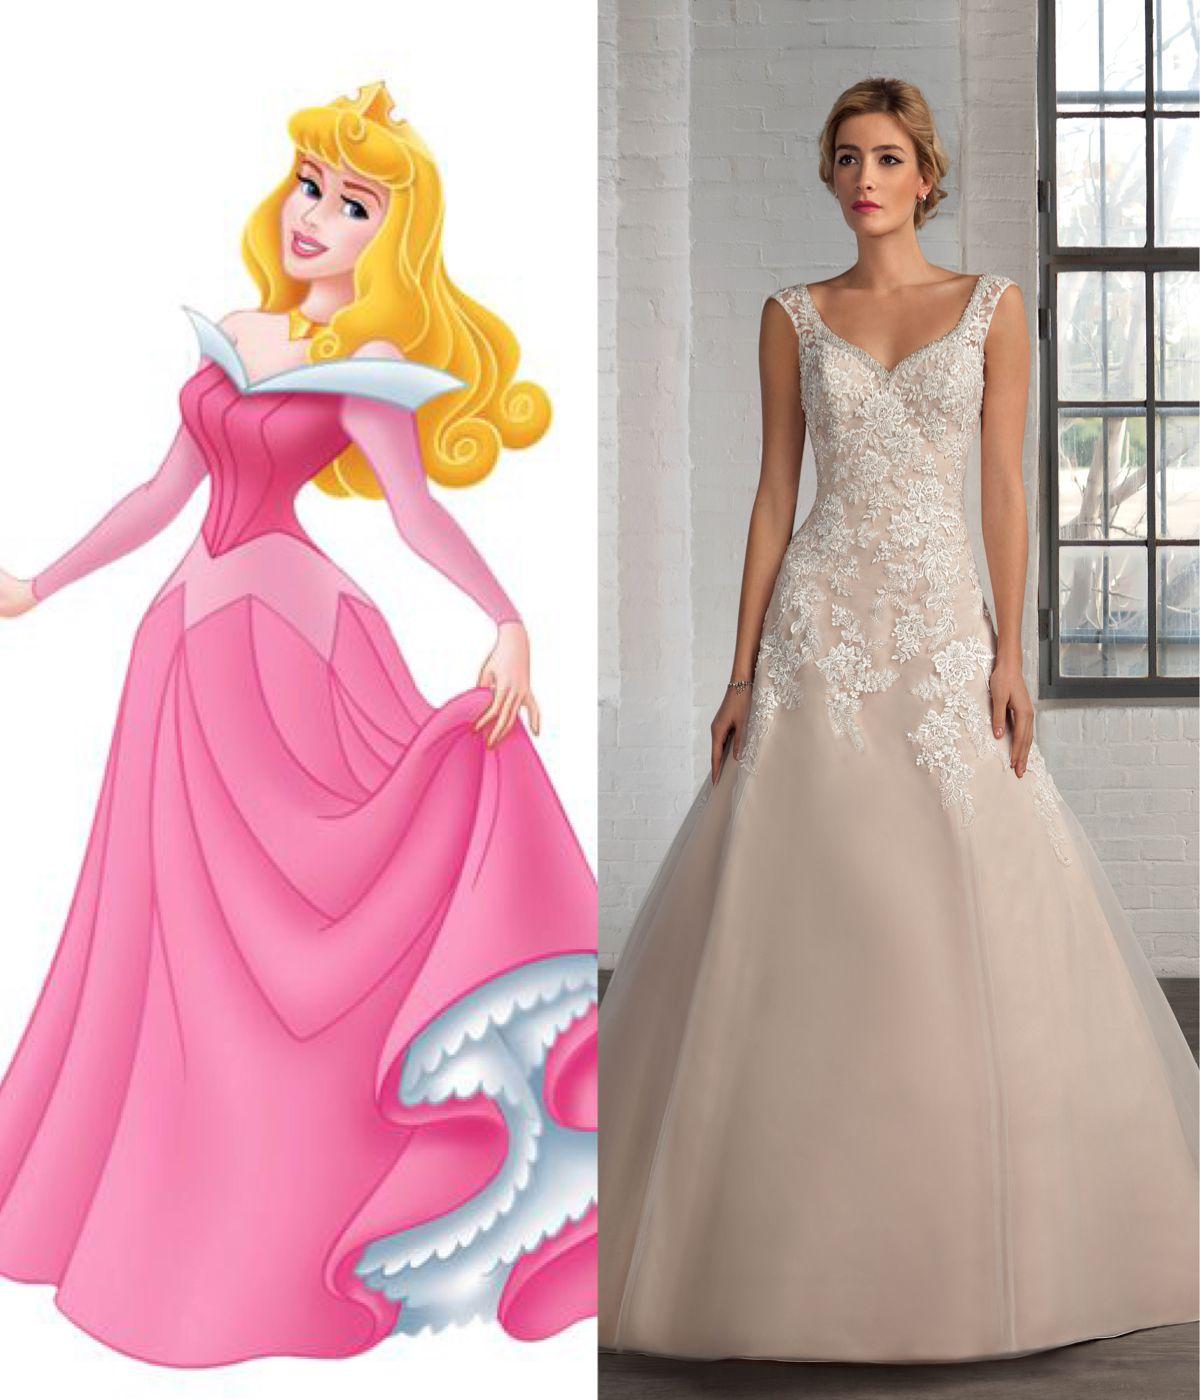 Modern wedding dresses for every Disney princess | Wedding dress ...